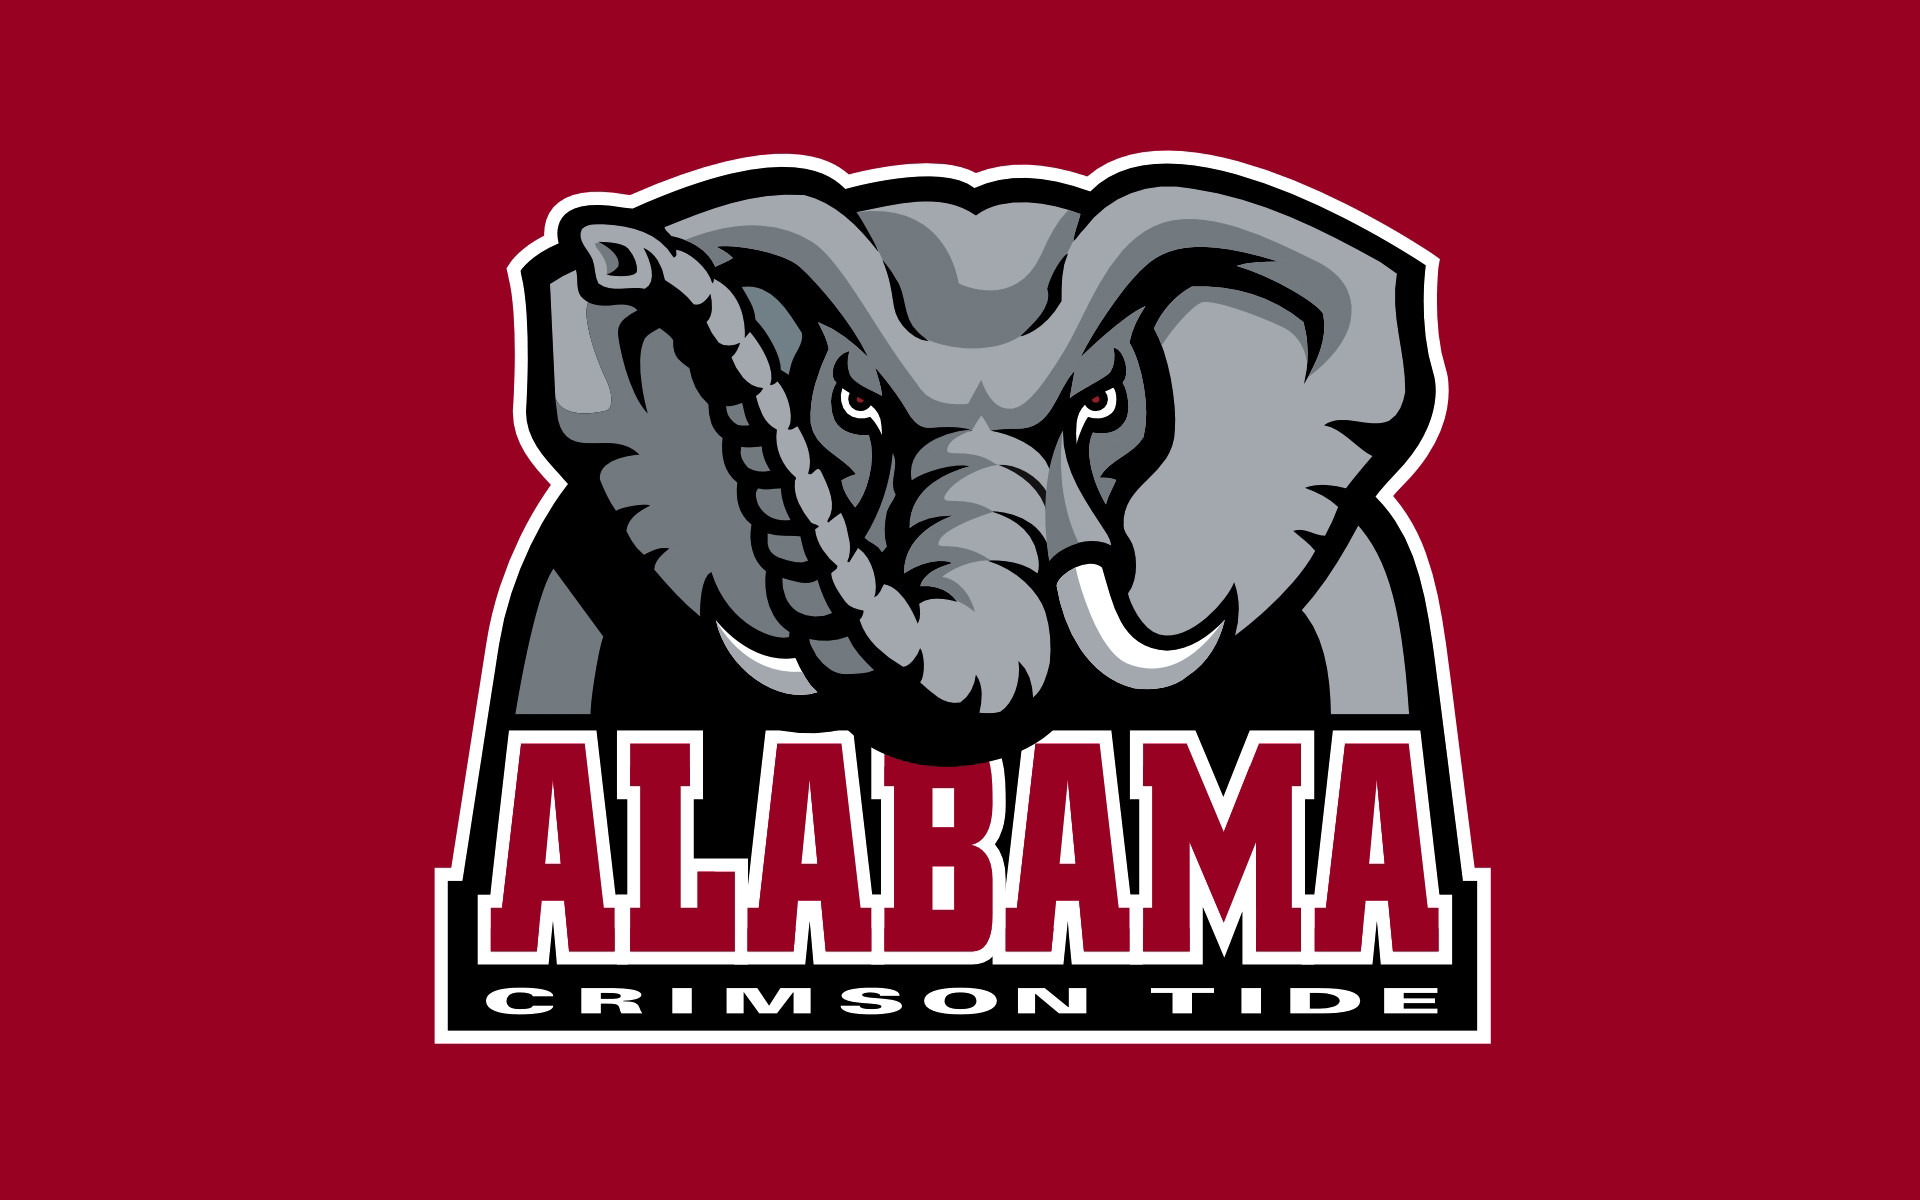 Wallpaper alabama crimson tide football, soccer, alabama, logo